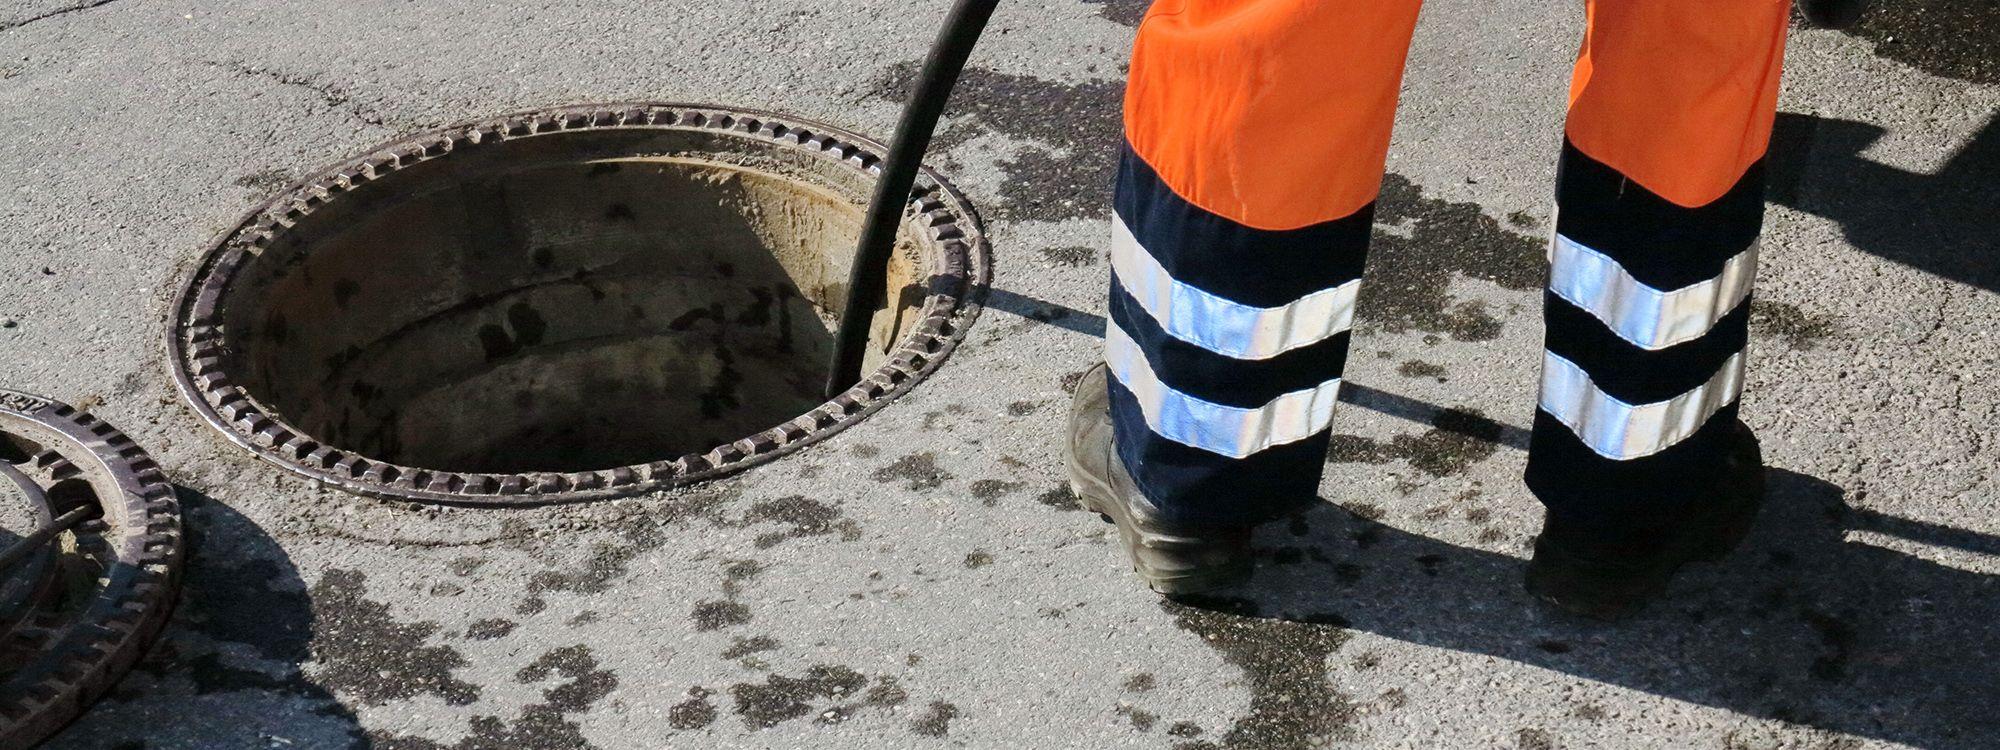 Drain Cleaning Nottingham - Drain Surveys | Sherwood Jet-Vac Ltd